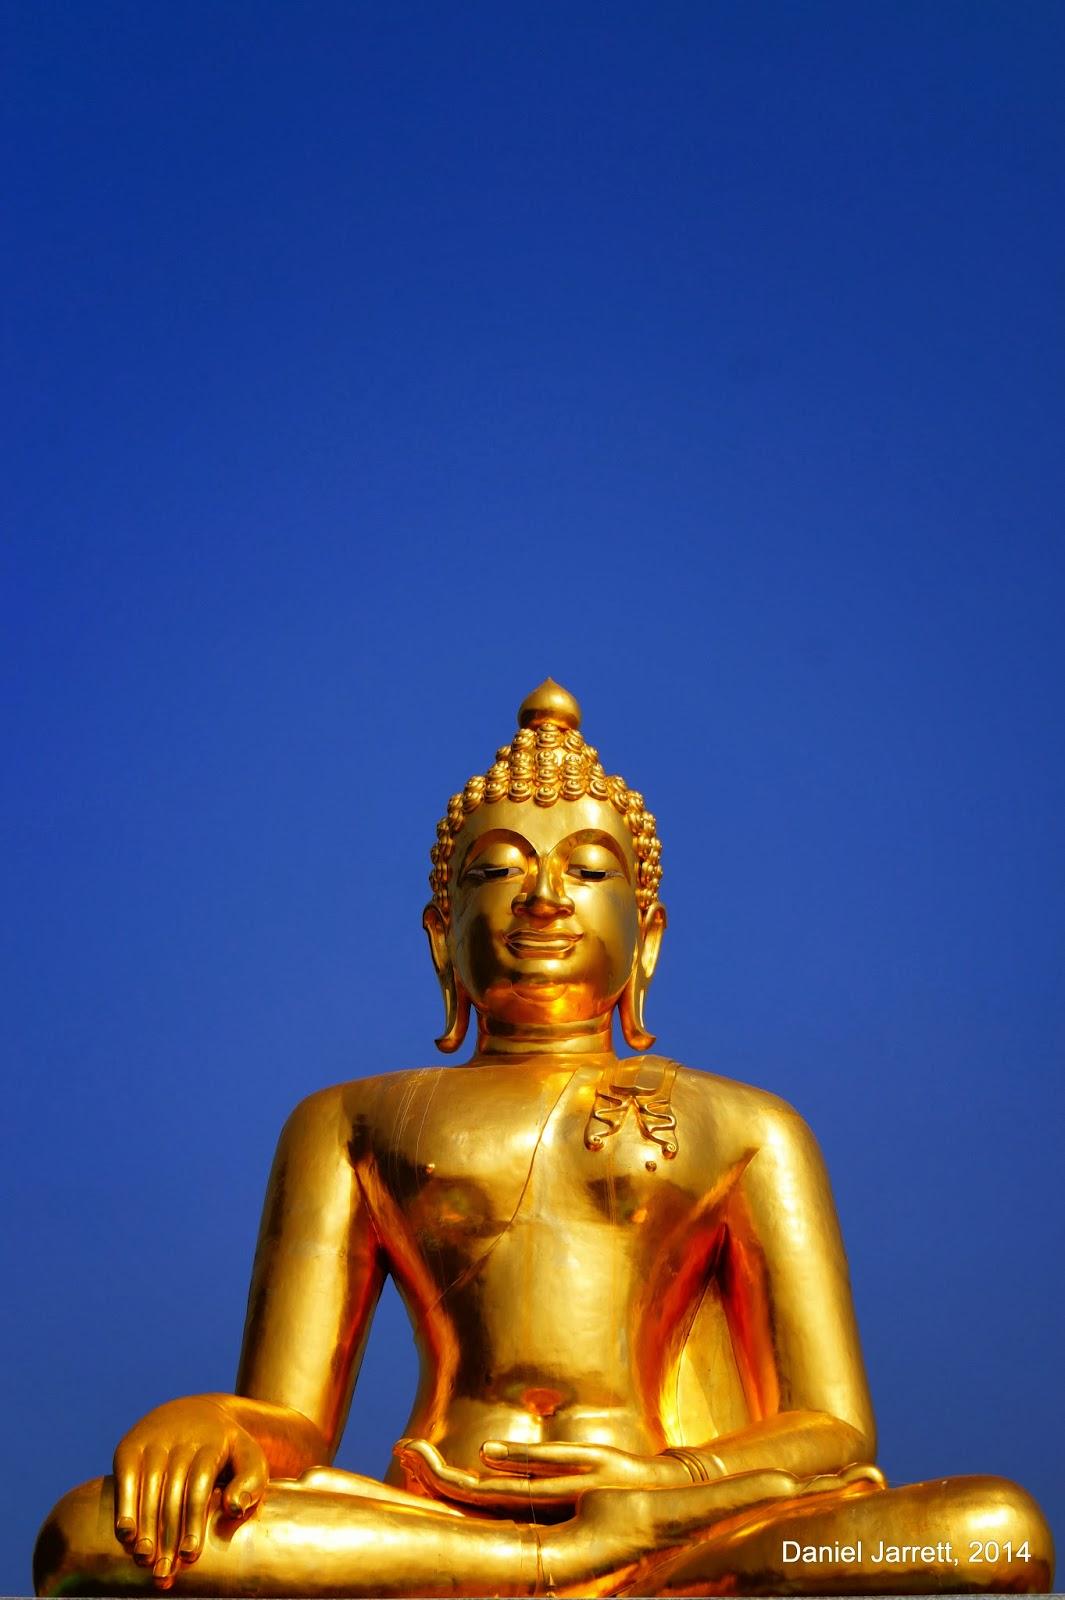 Tung Luang Chalerm Phrakiat Chiang Saen